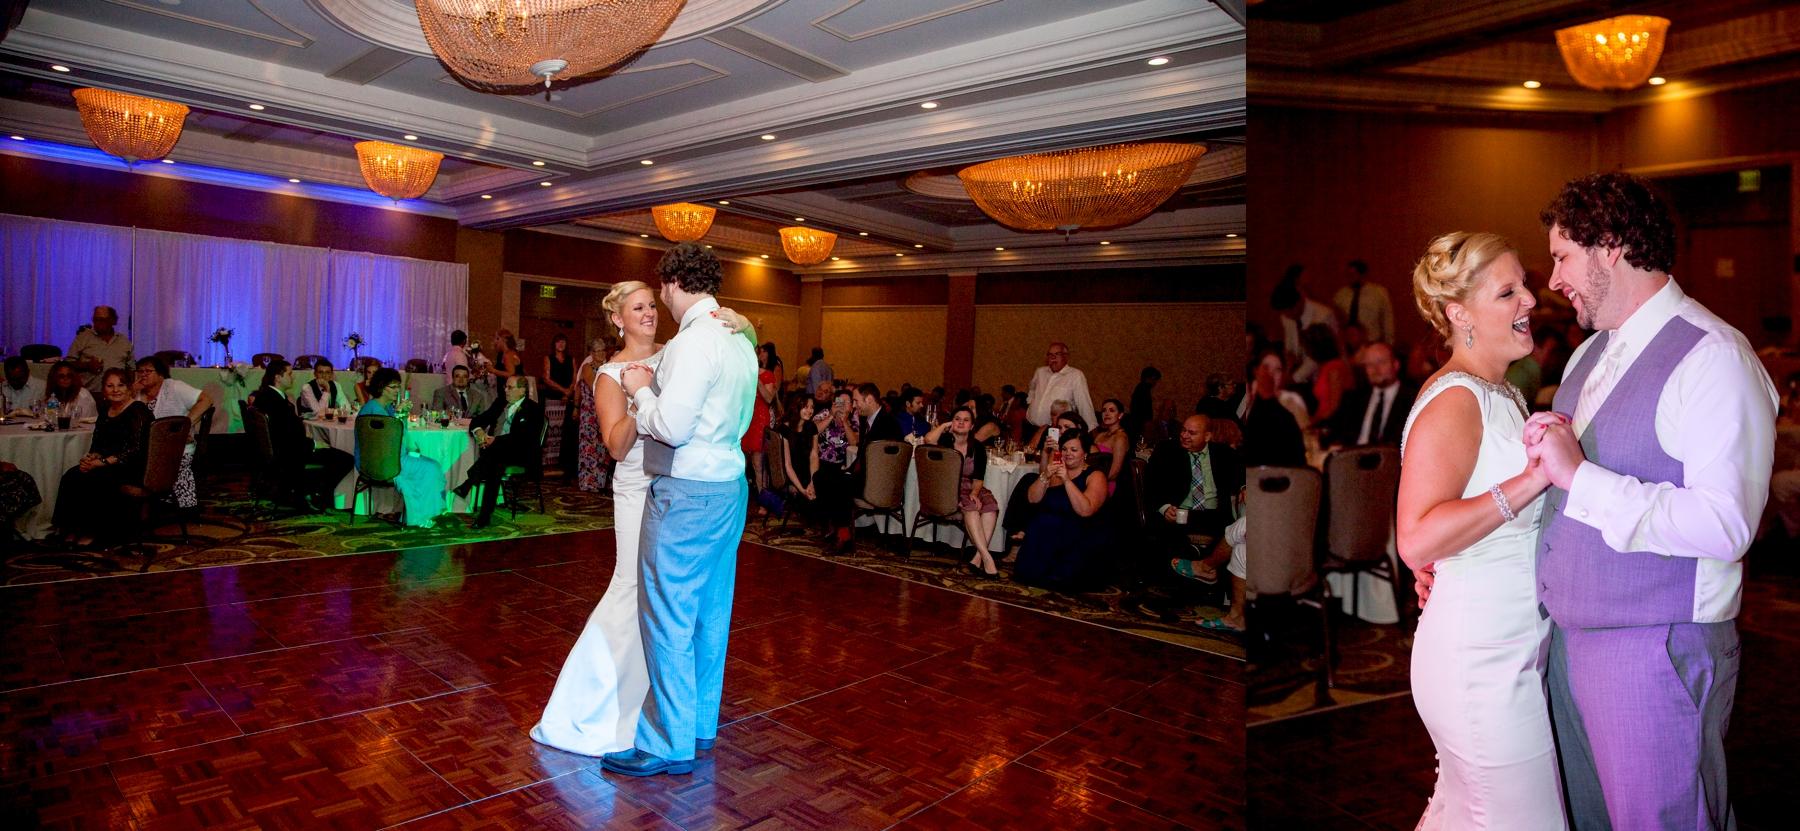 Brandon_Shafer_Photography_Chris_Lauren_Michigan_State_Capital_Wedding_0048.jpg